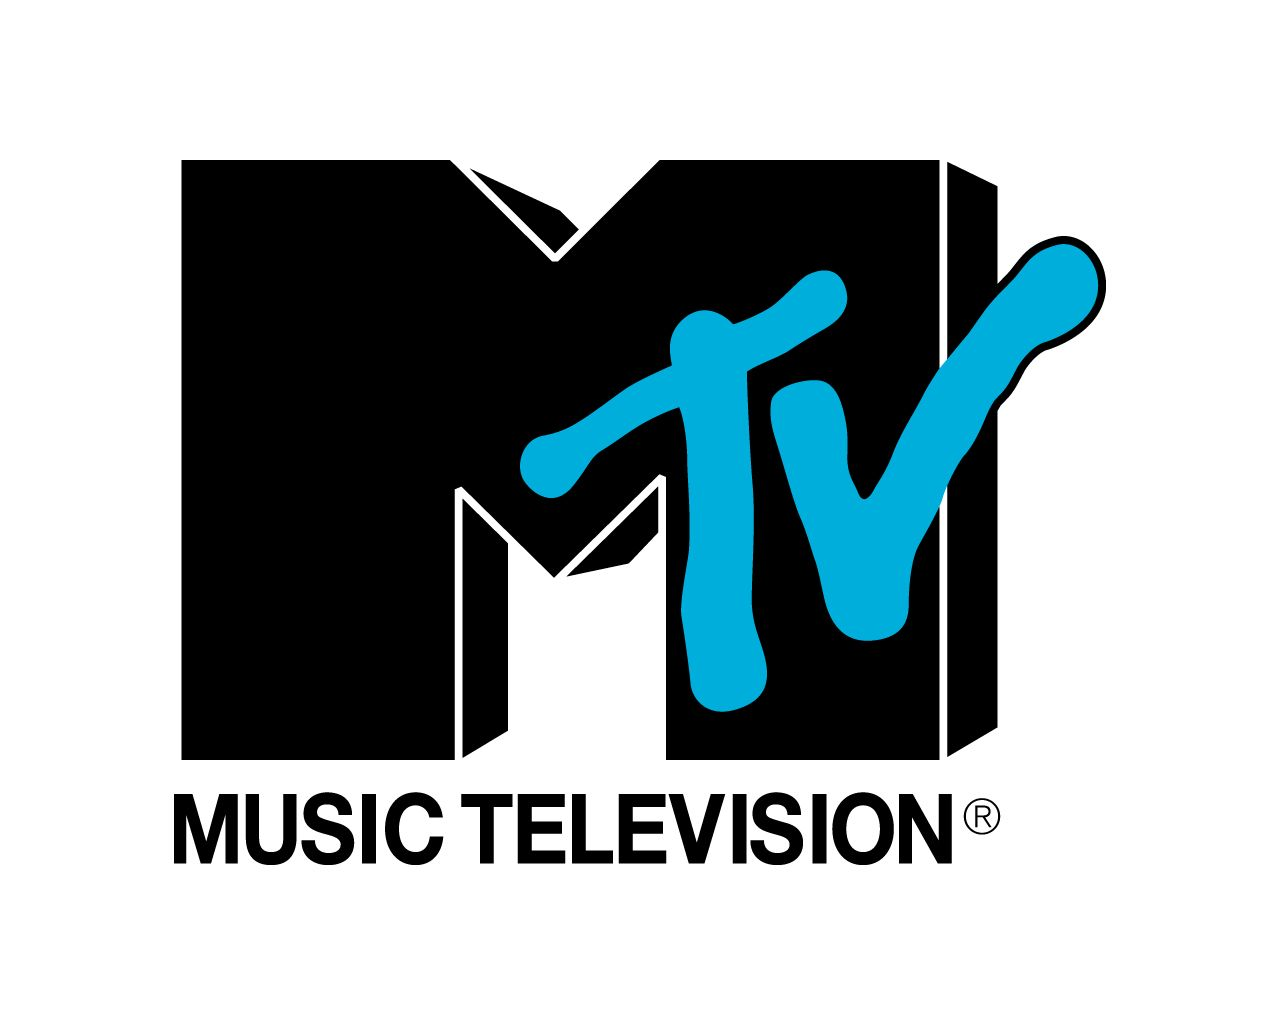 Logos - Mtv Logo Vector PNG